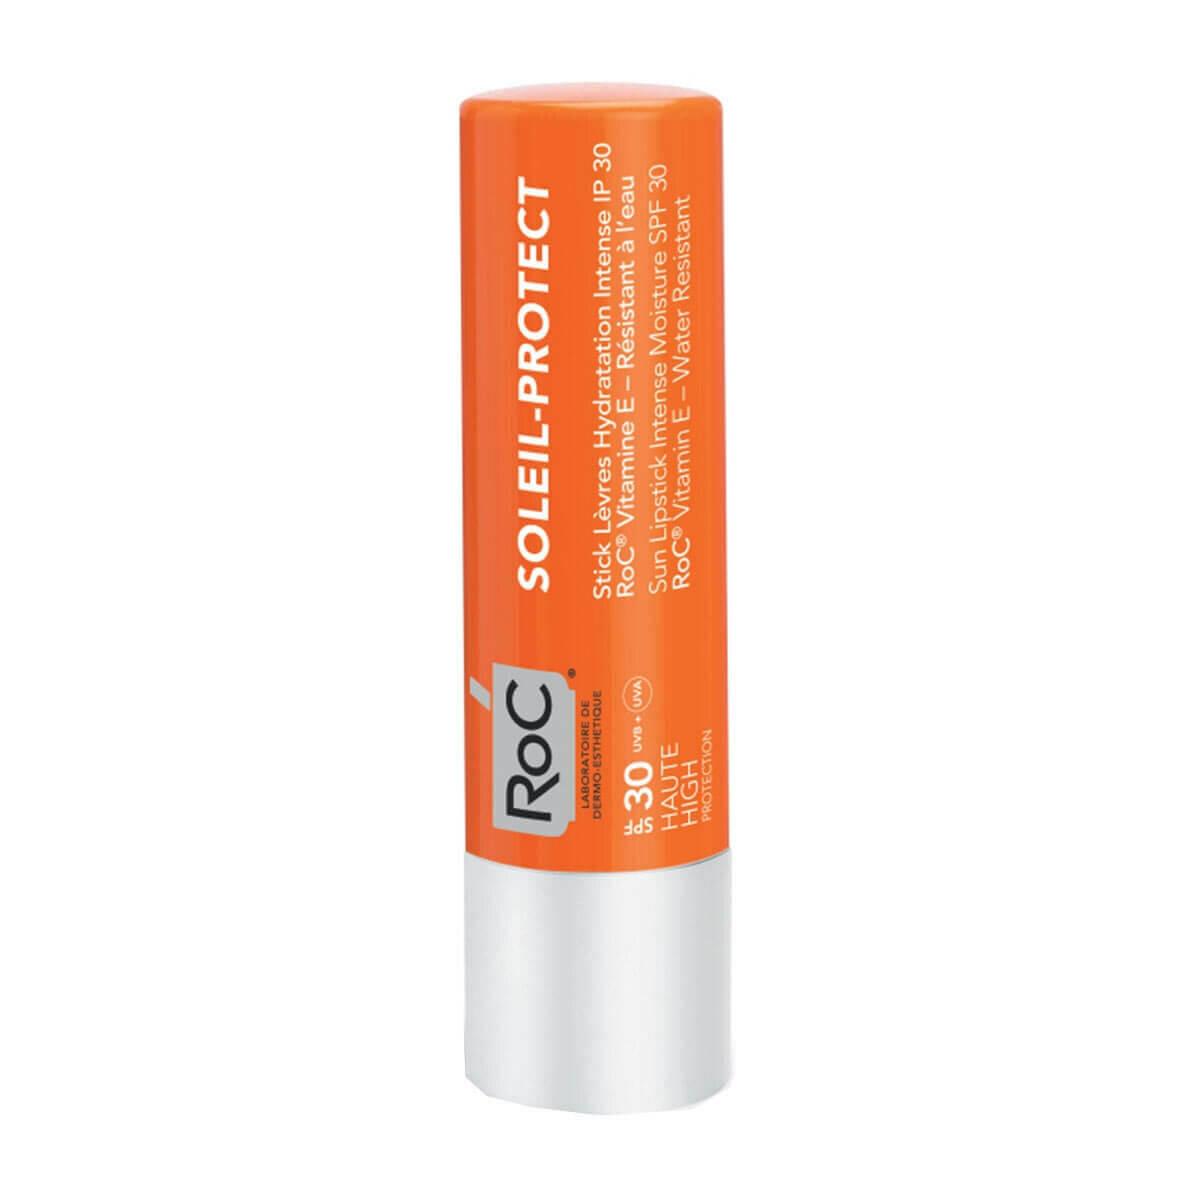 Soleil Protexion SPF30 Stick 4,9 Gr